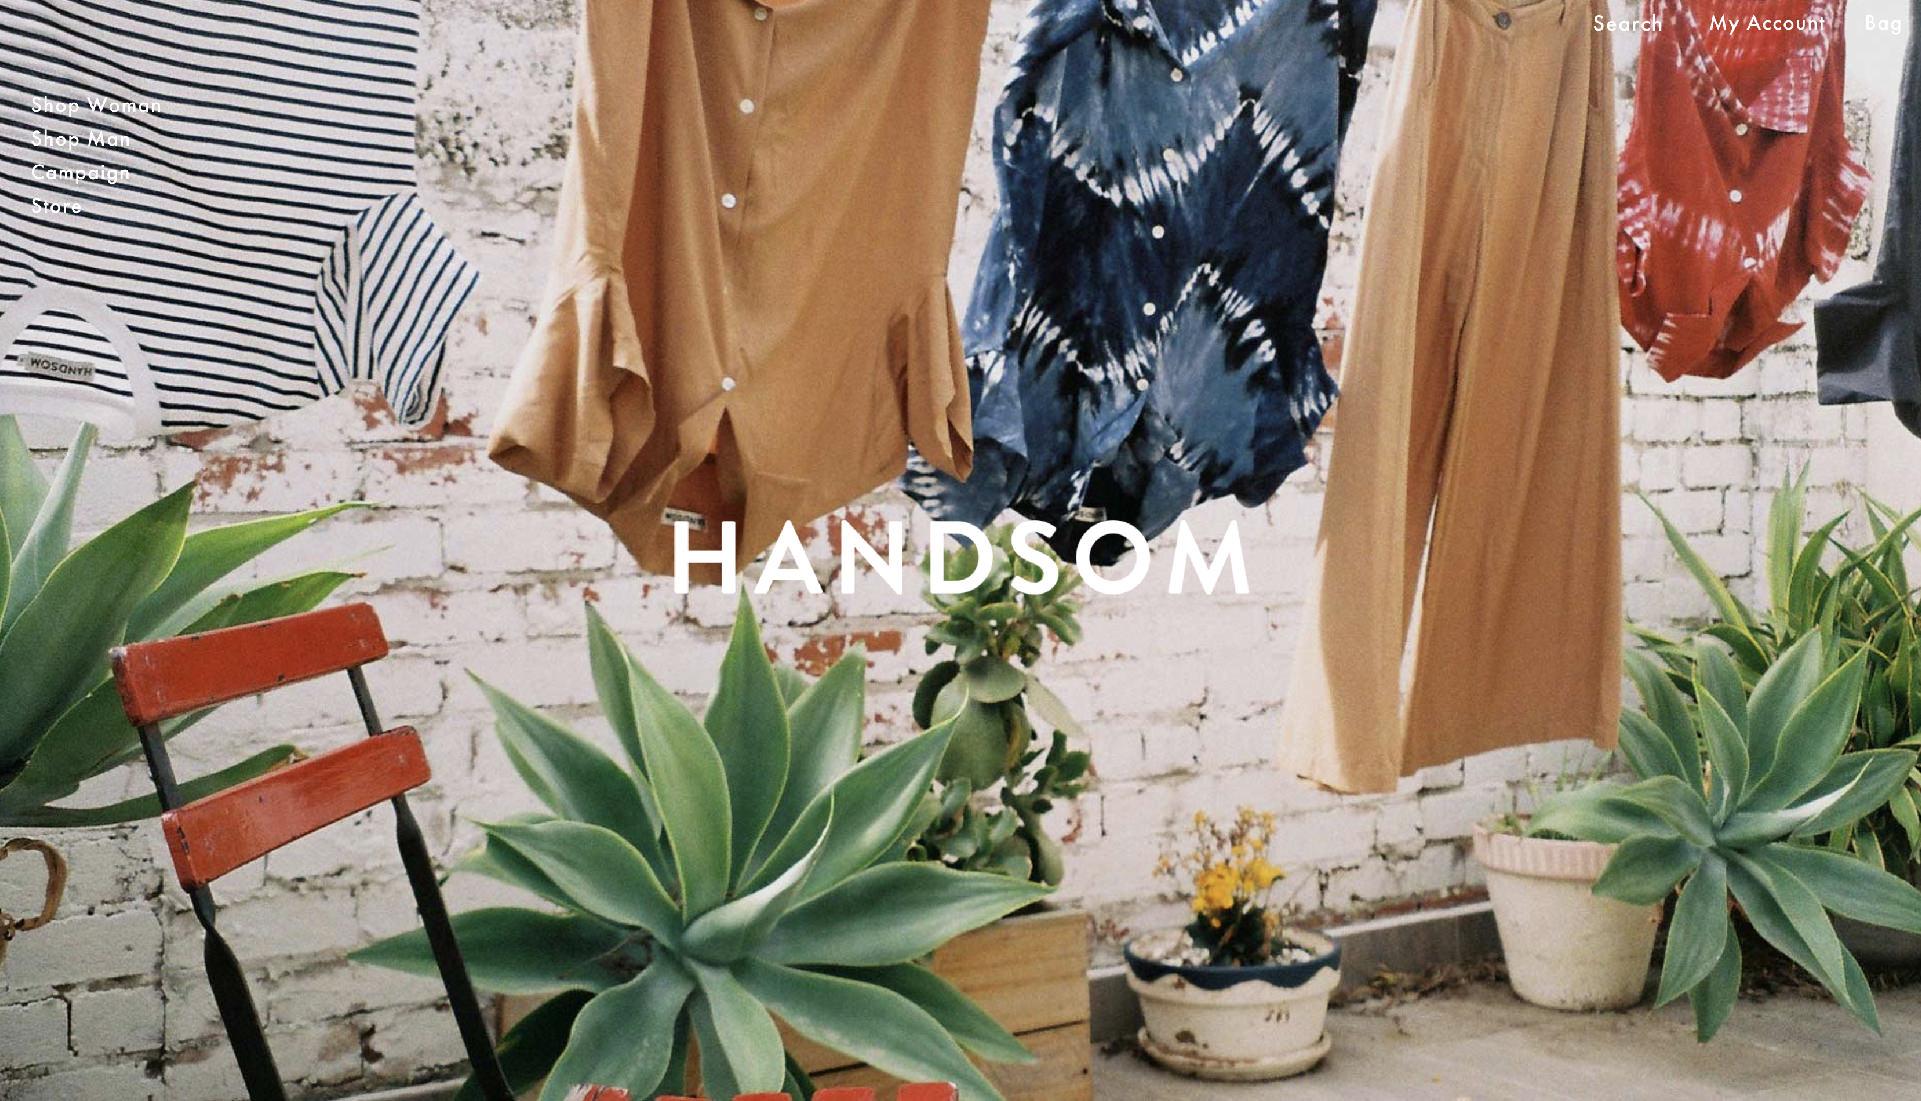 Handsom-01